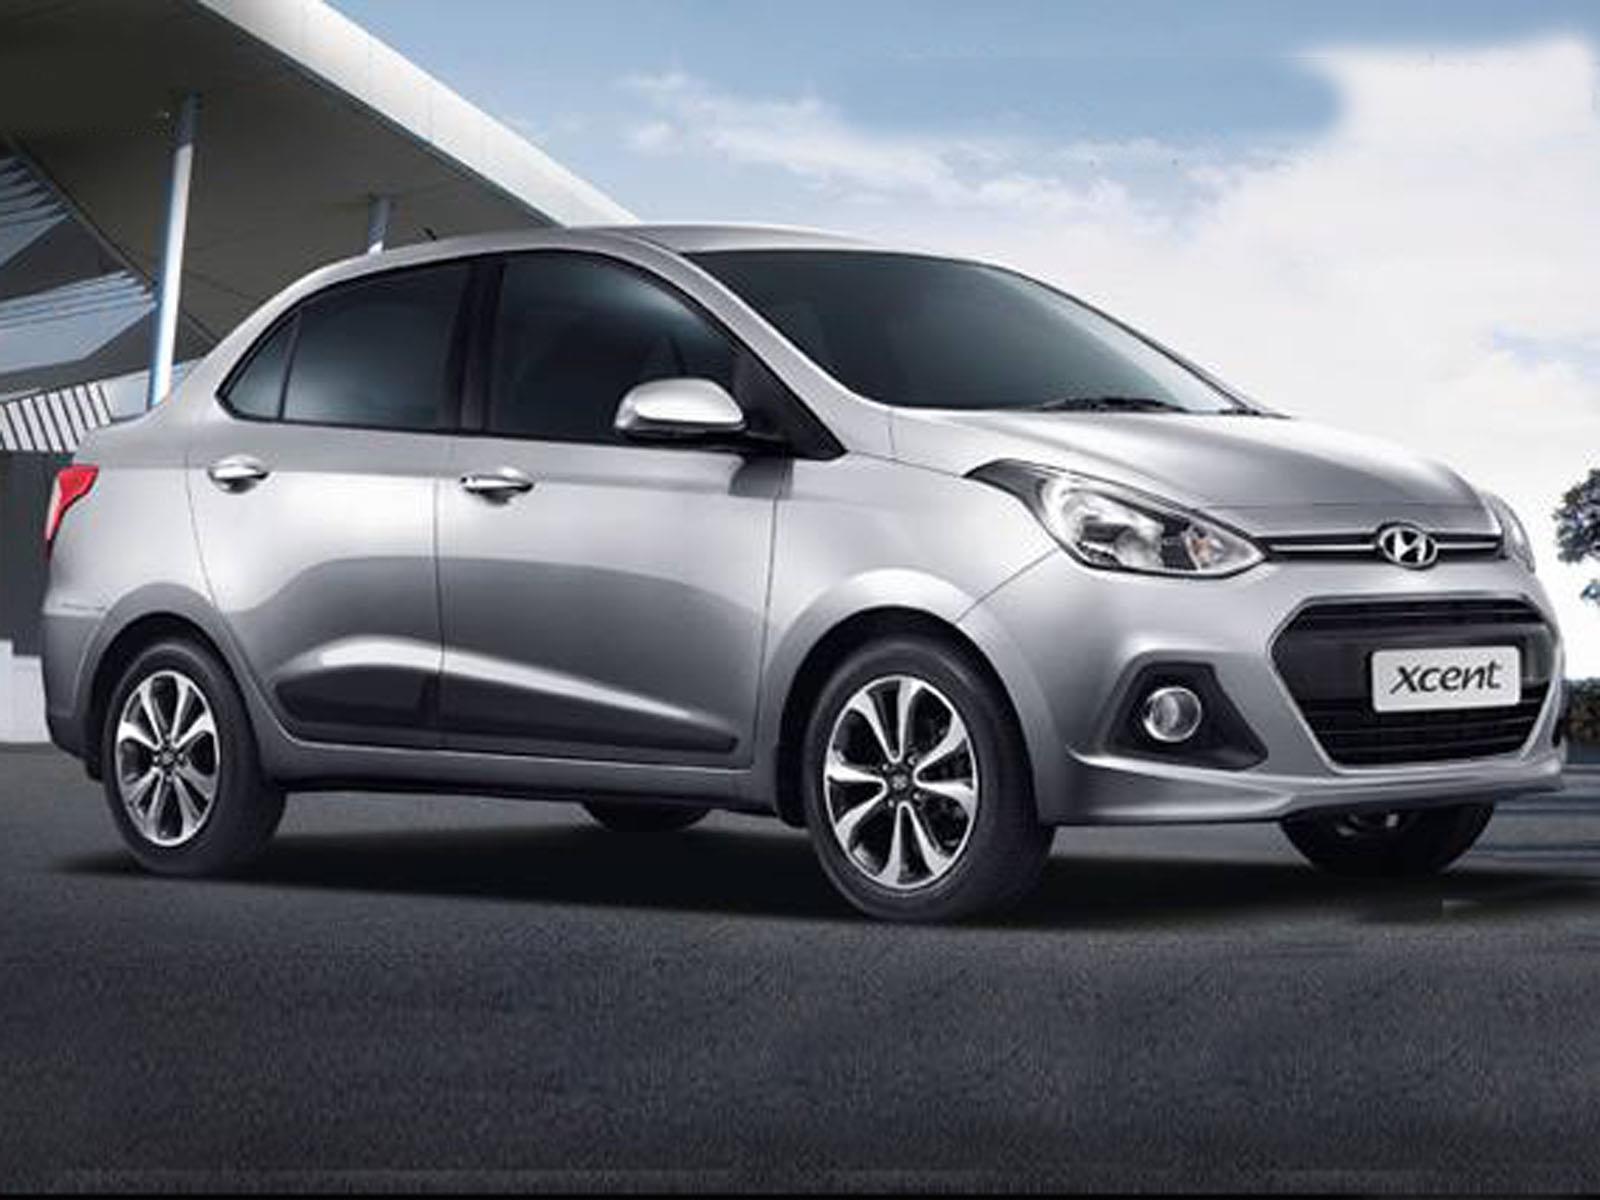 Hyundai Xcent La Versi 243 N Sed 225 N Del I10 Autocosmos Com